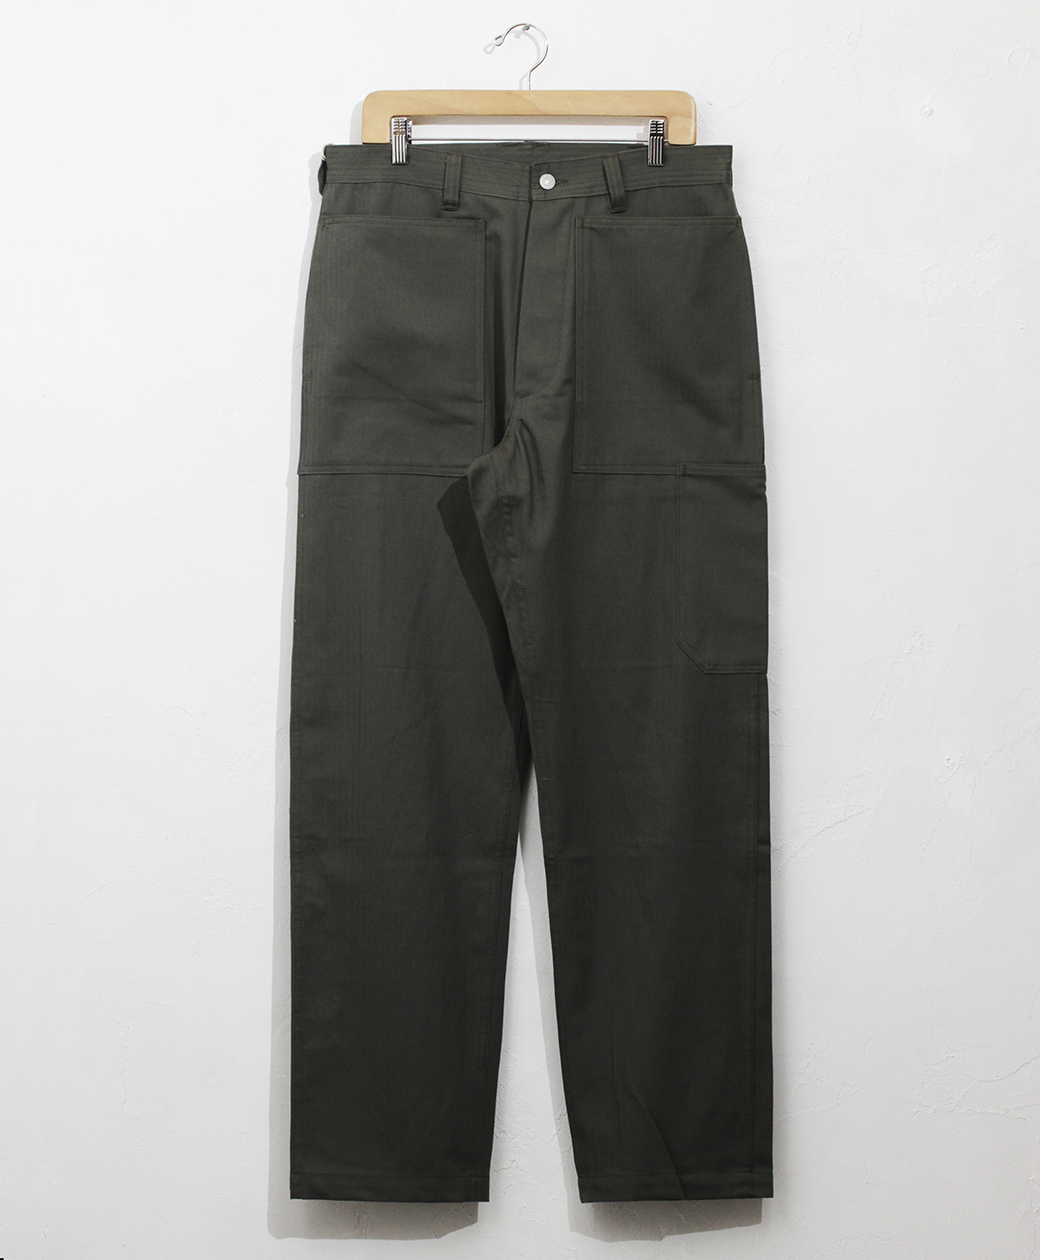 SASSAFRAS Transplant Pants(Herrinbone)